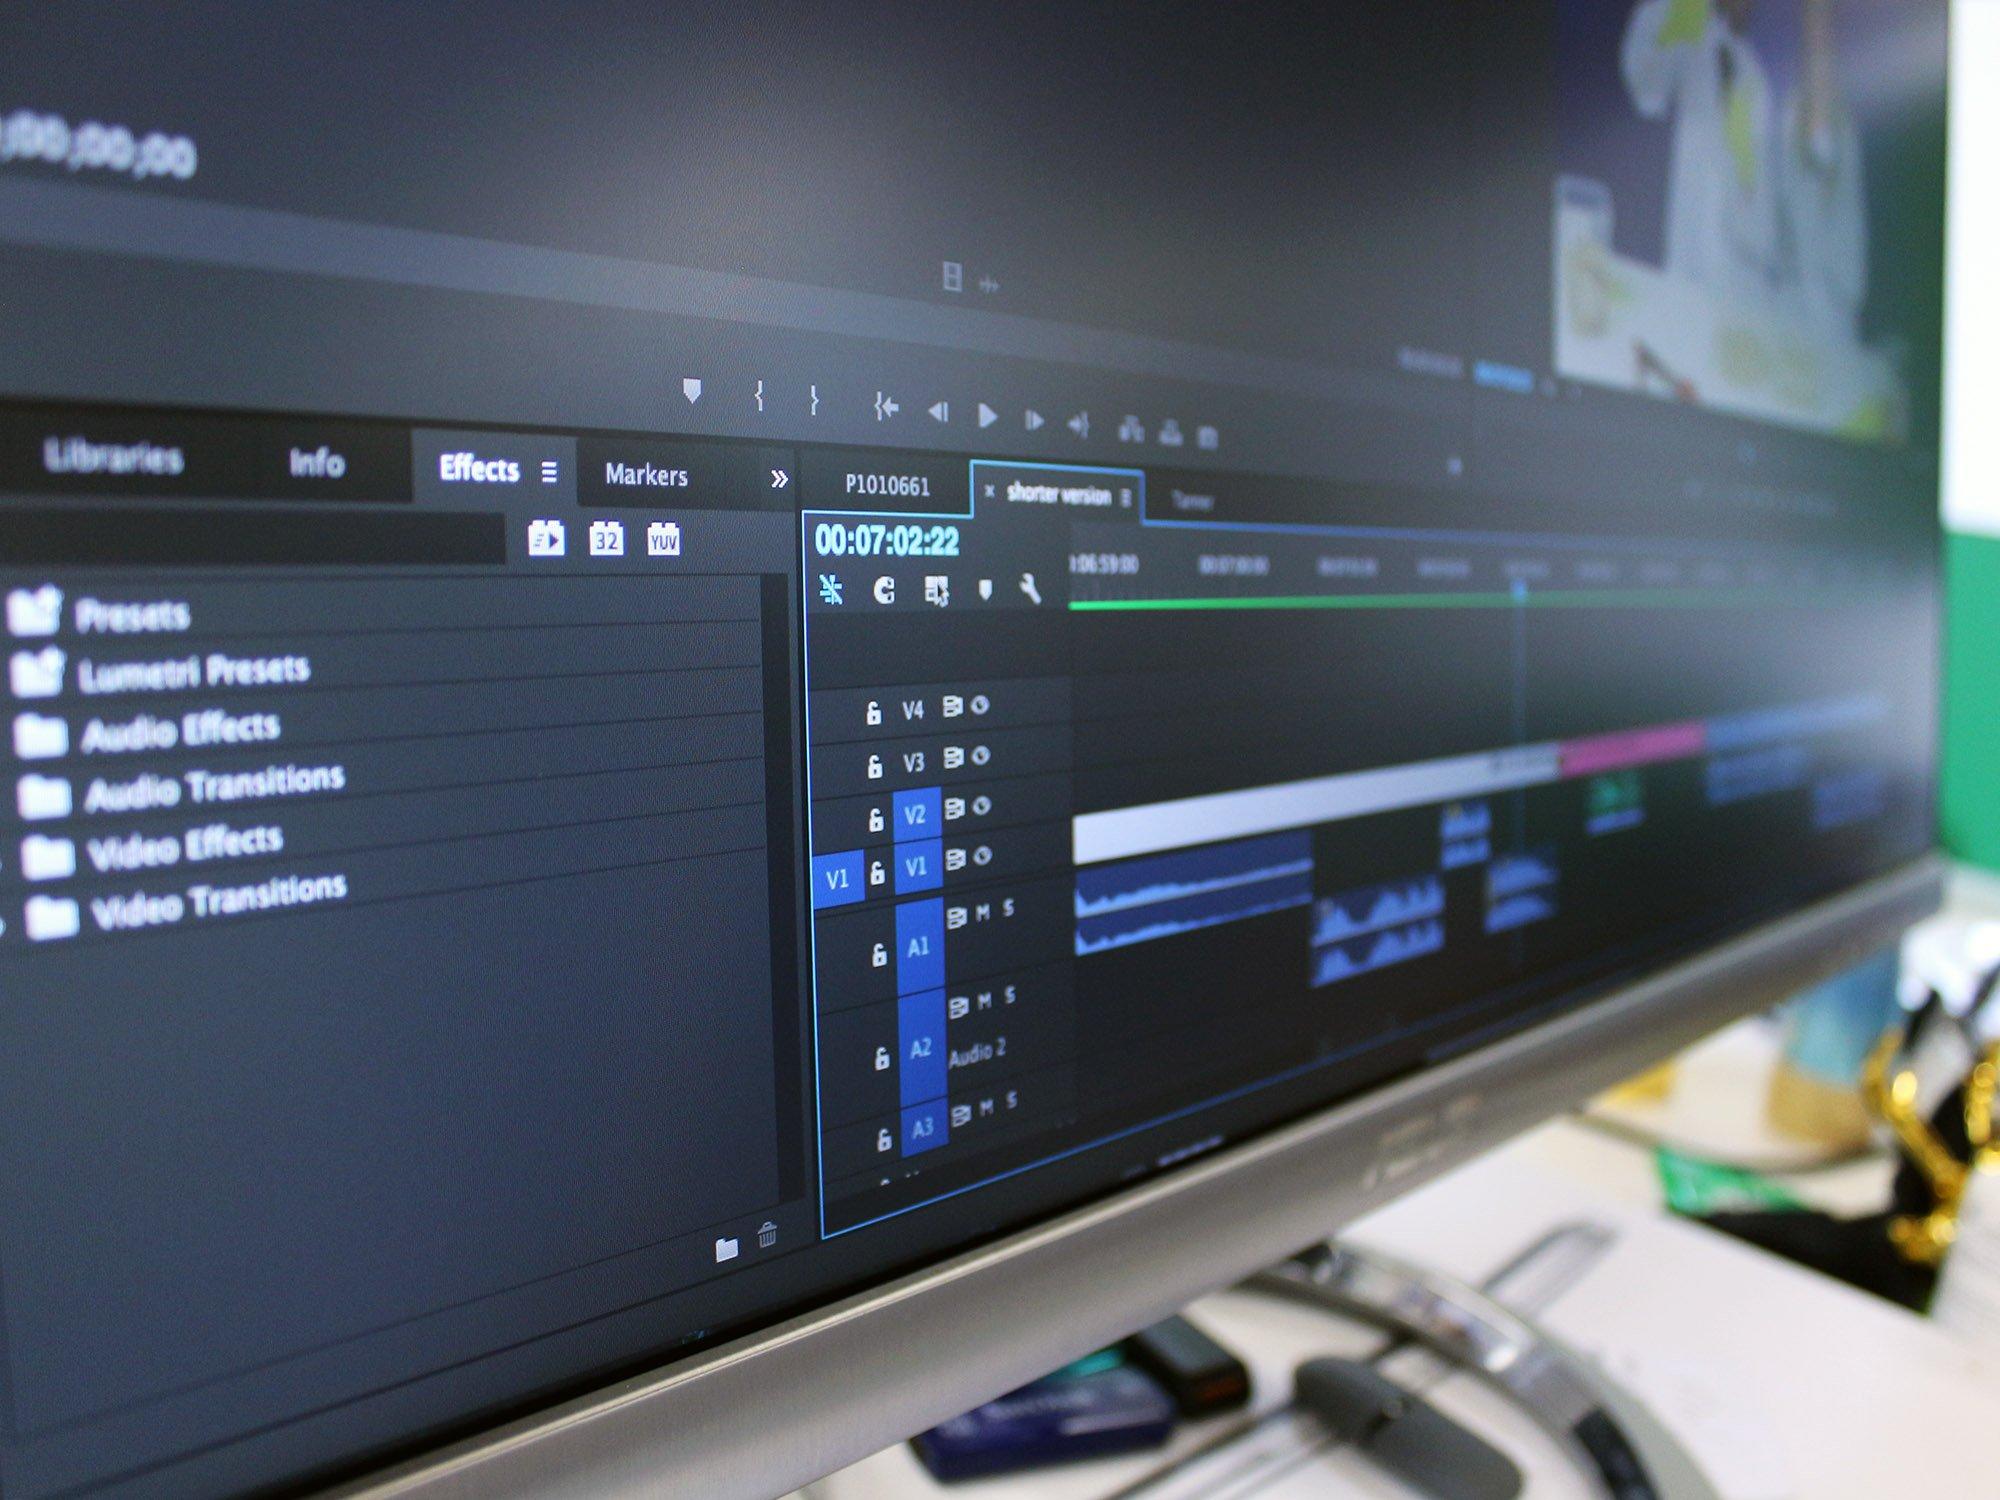 Fall Creators Update Wallpaper Best Home Video Editing Software Windows Central